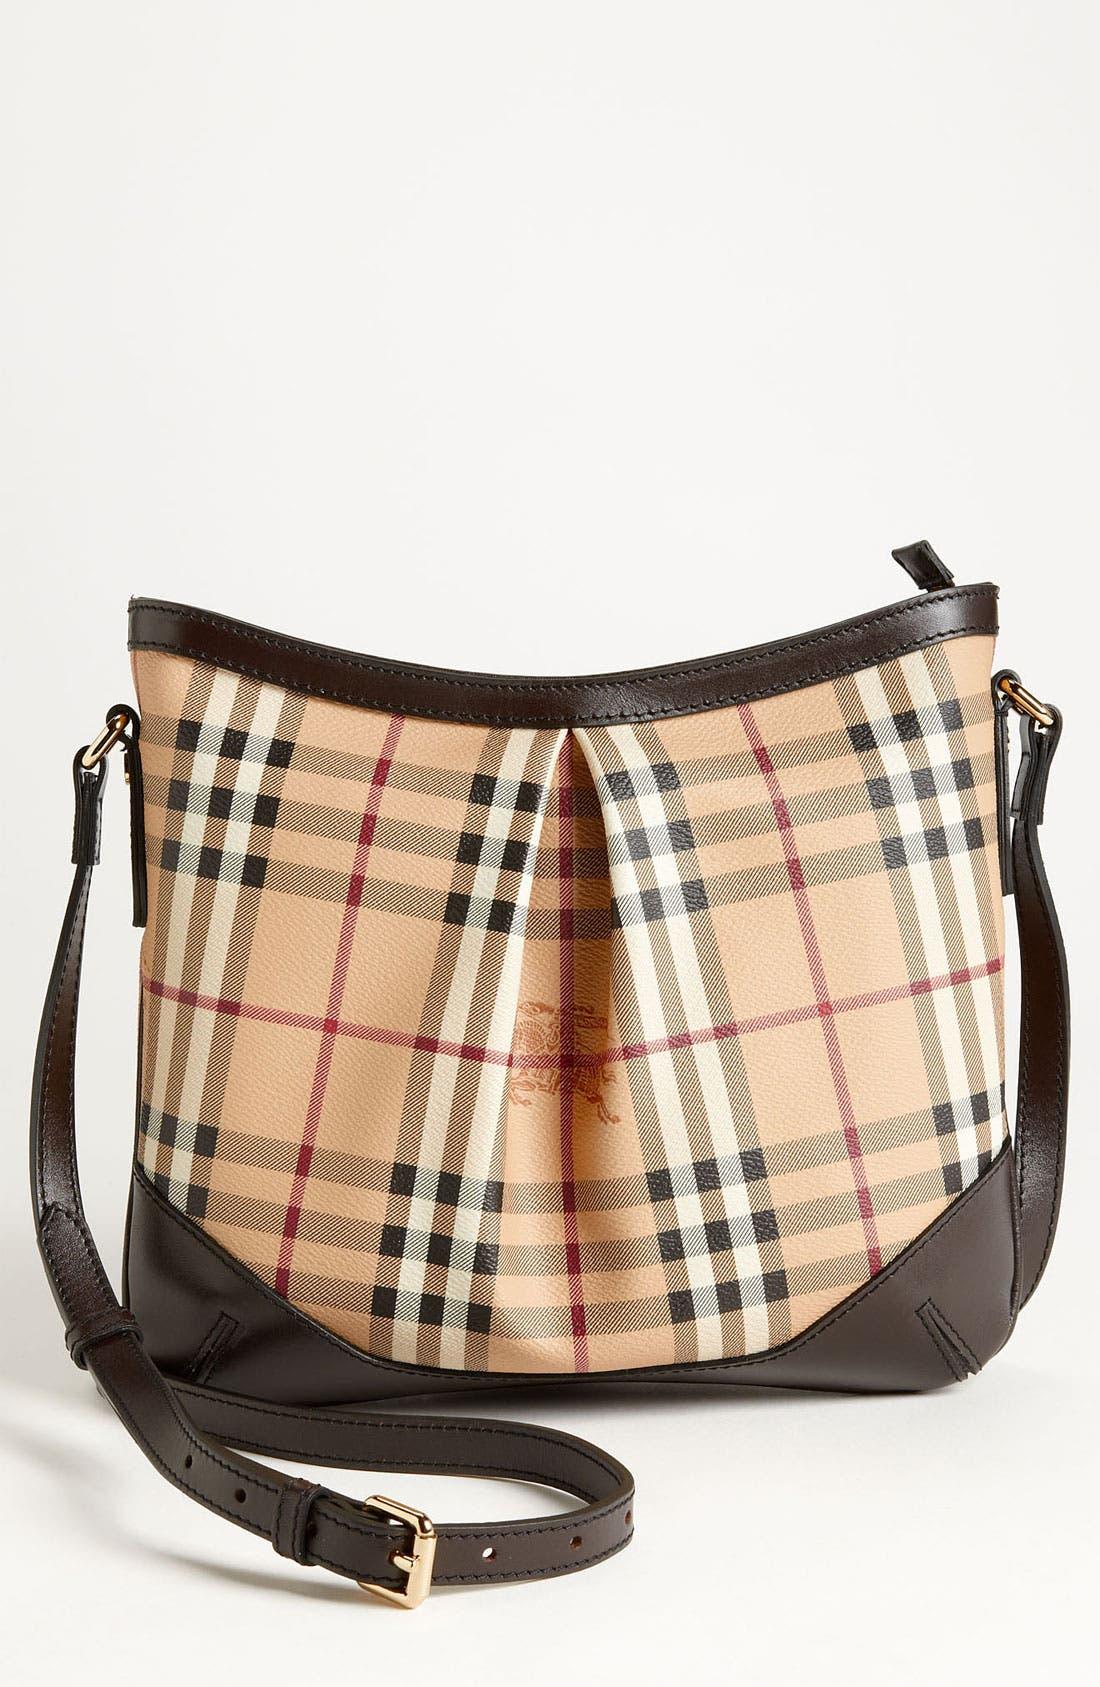 Main Image - Burberry 'Haymarket Check' Crossbody Bag